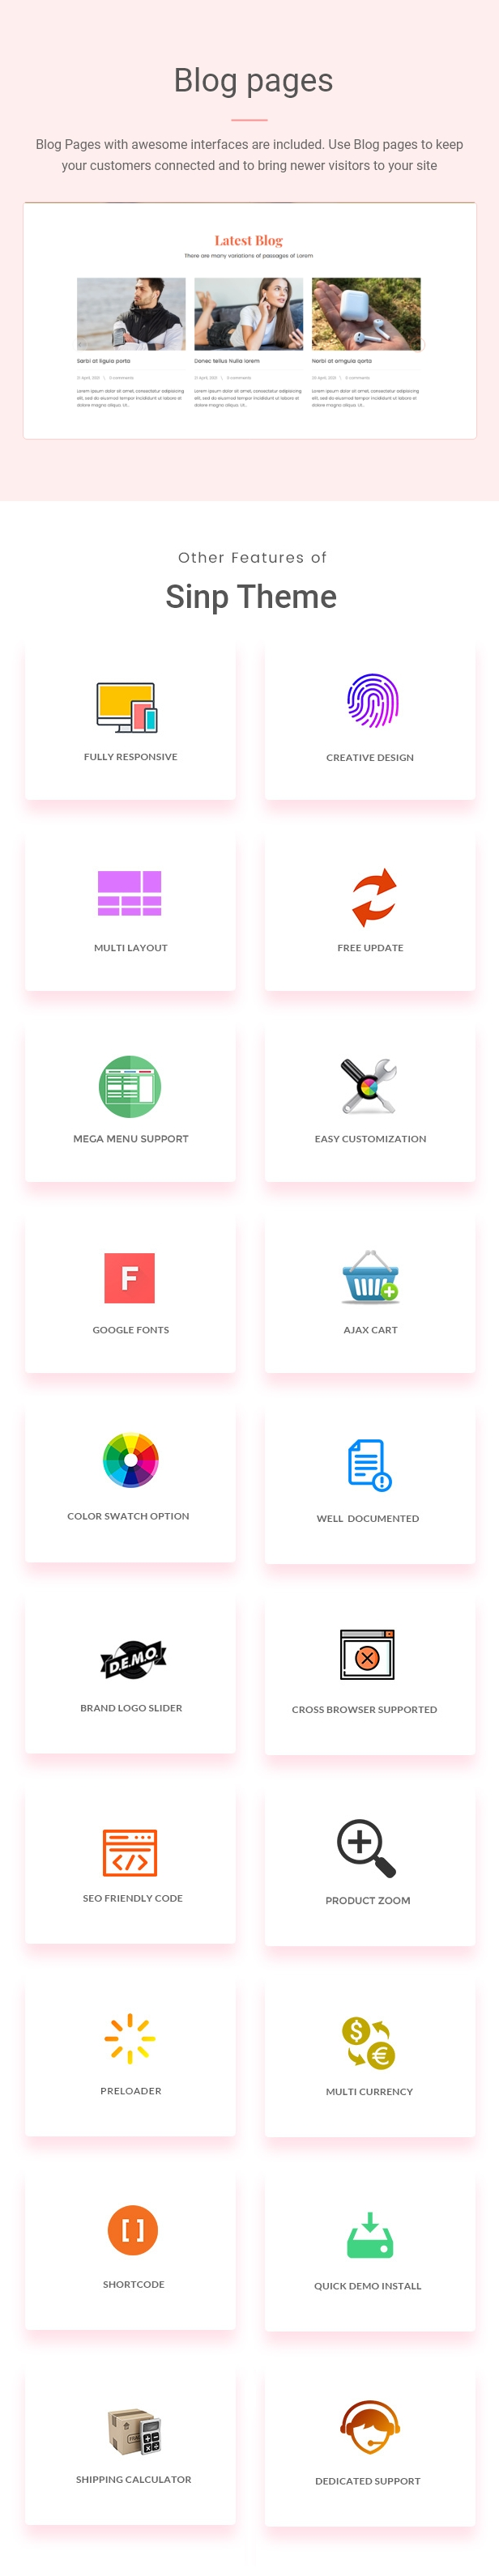 Sinp - Single Product Multipurpose Shopify Theme - 3